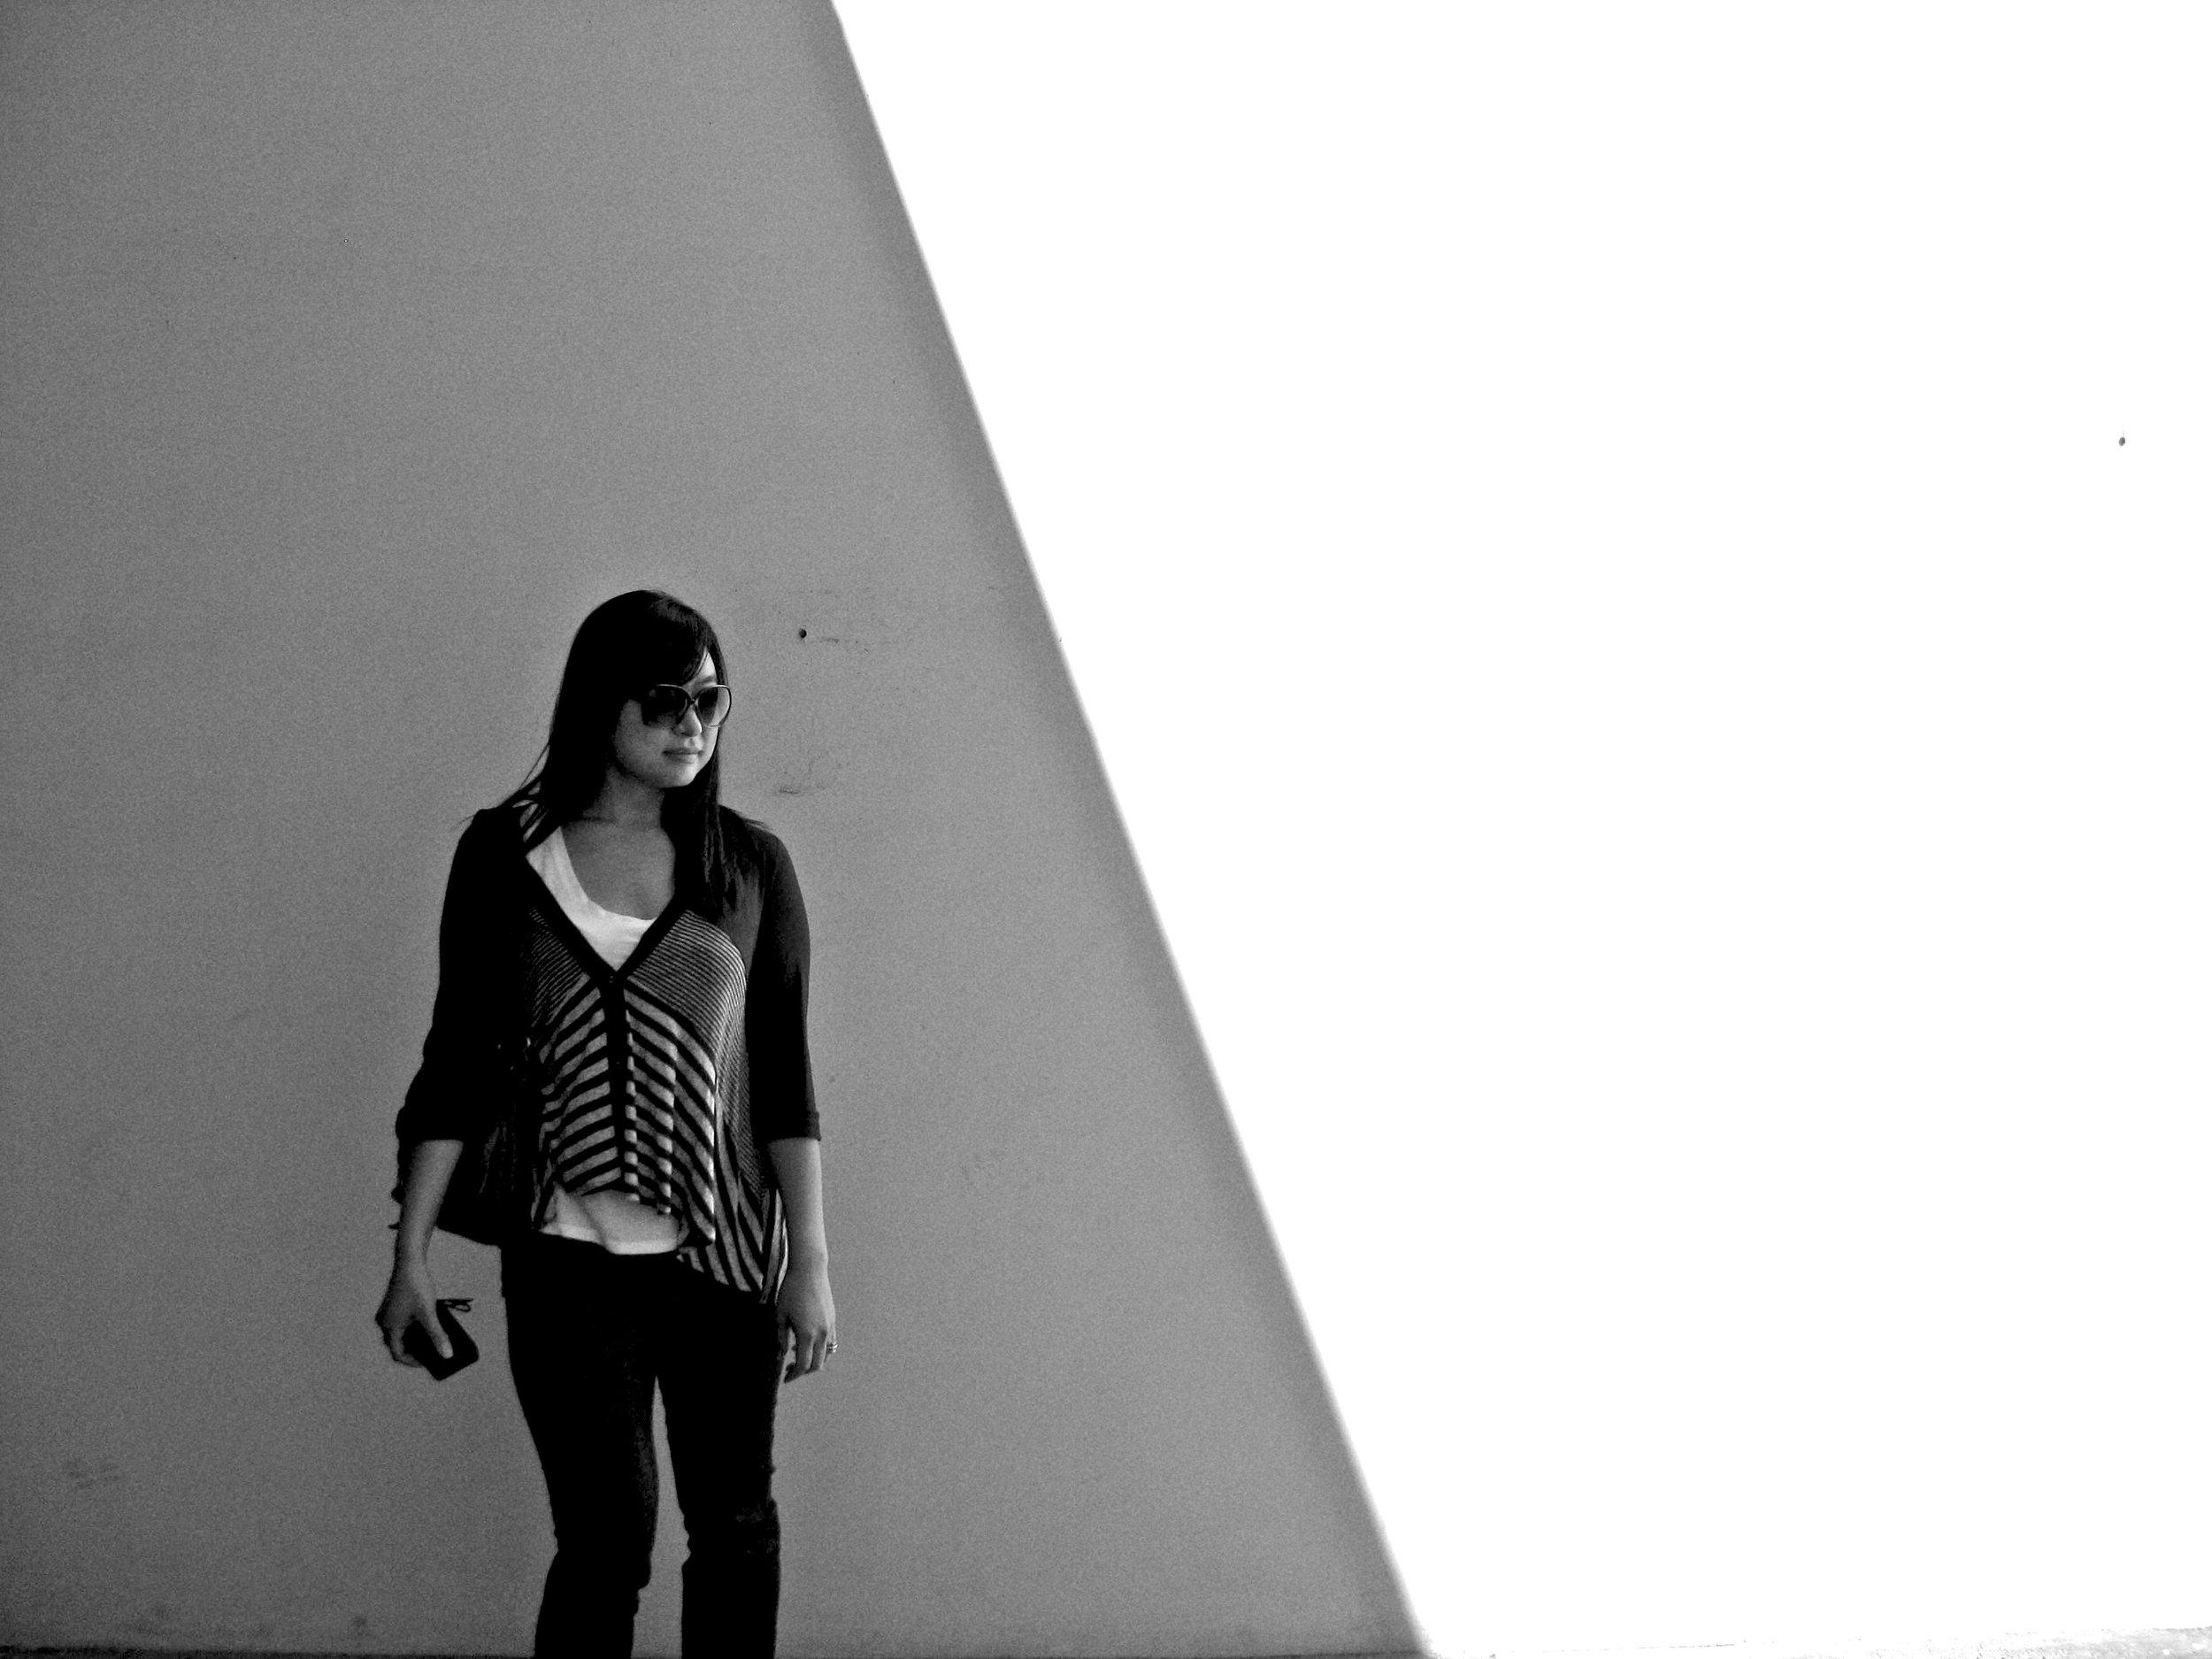 sharon_los angeles - california, usa